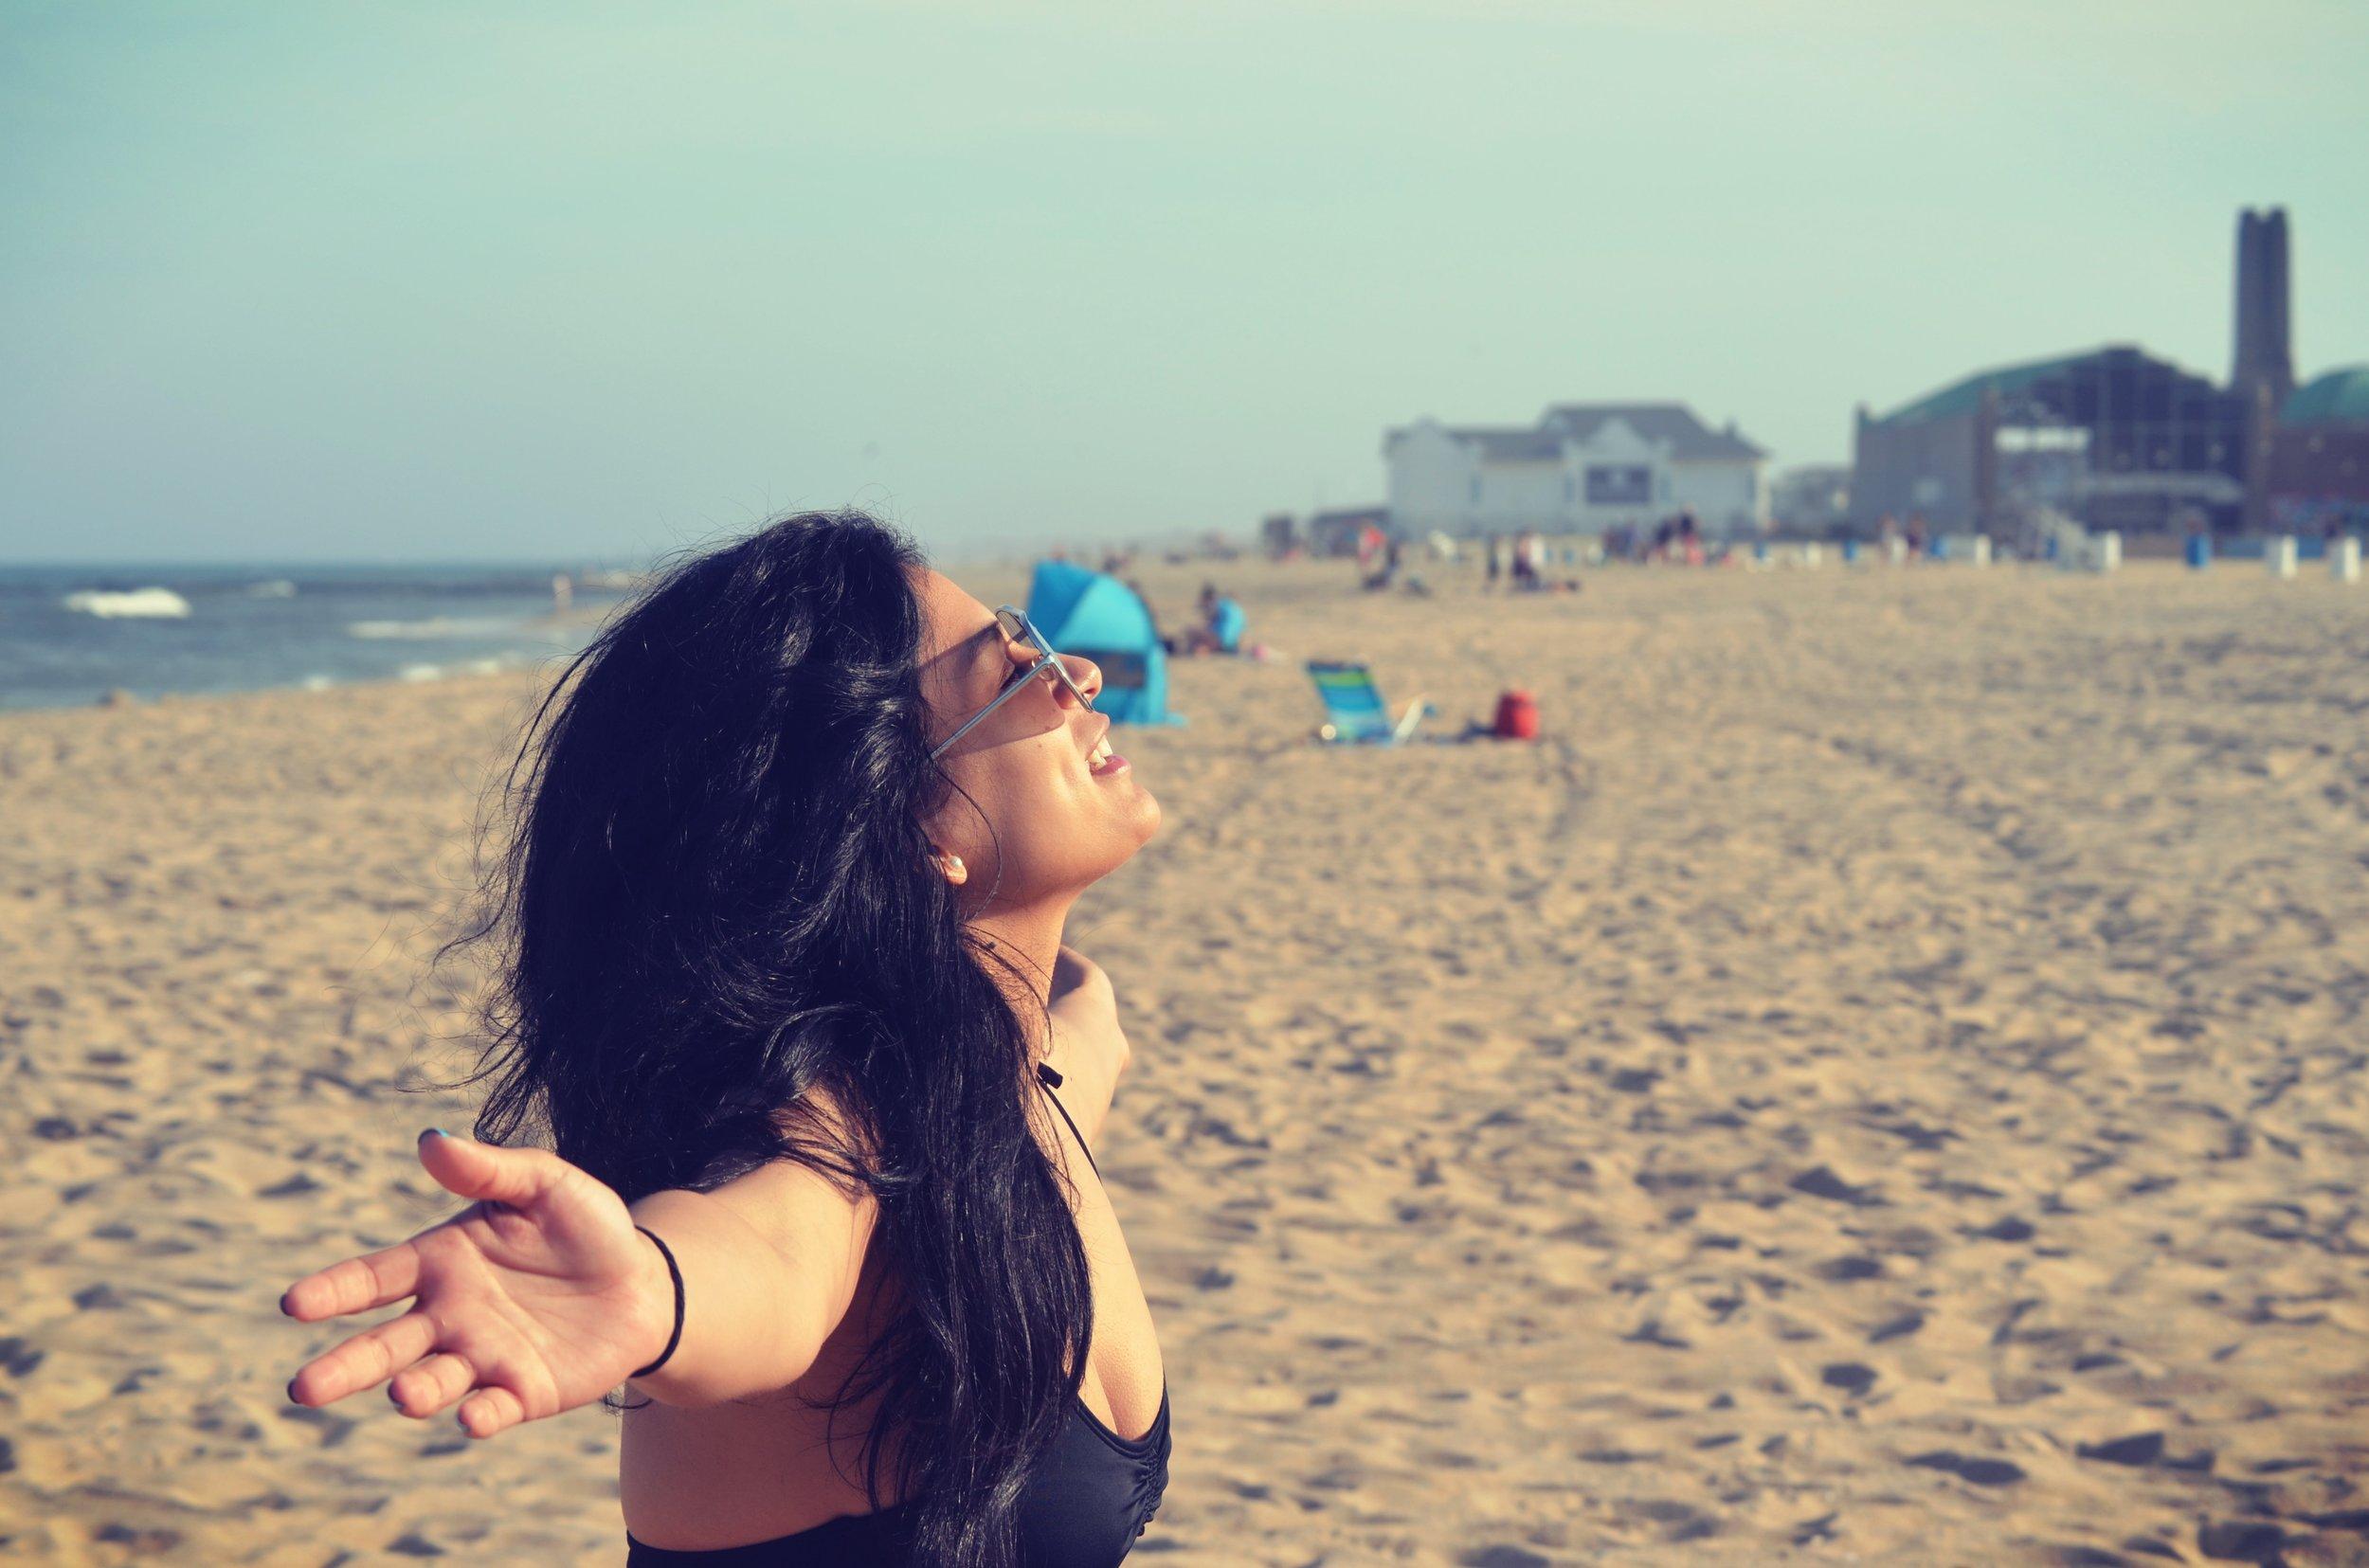 beach-beautiful-female-1124093.jpg